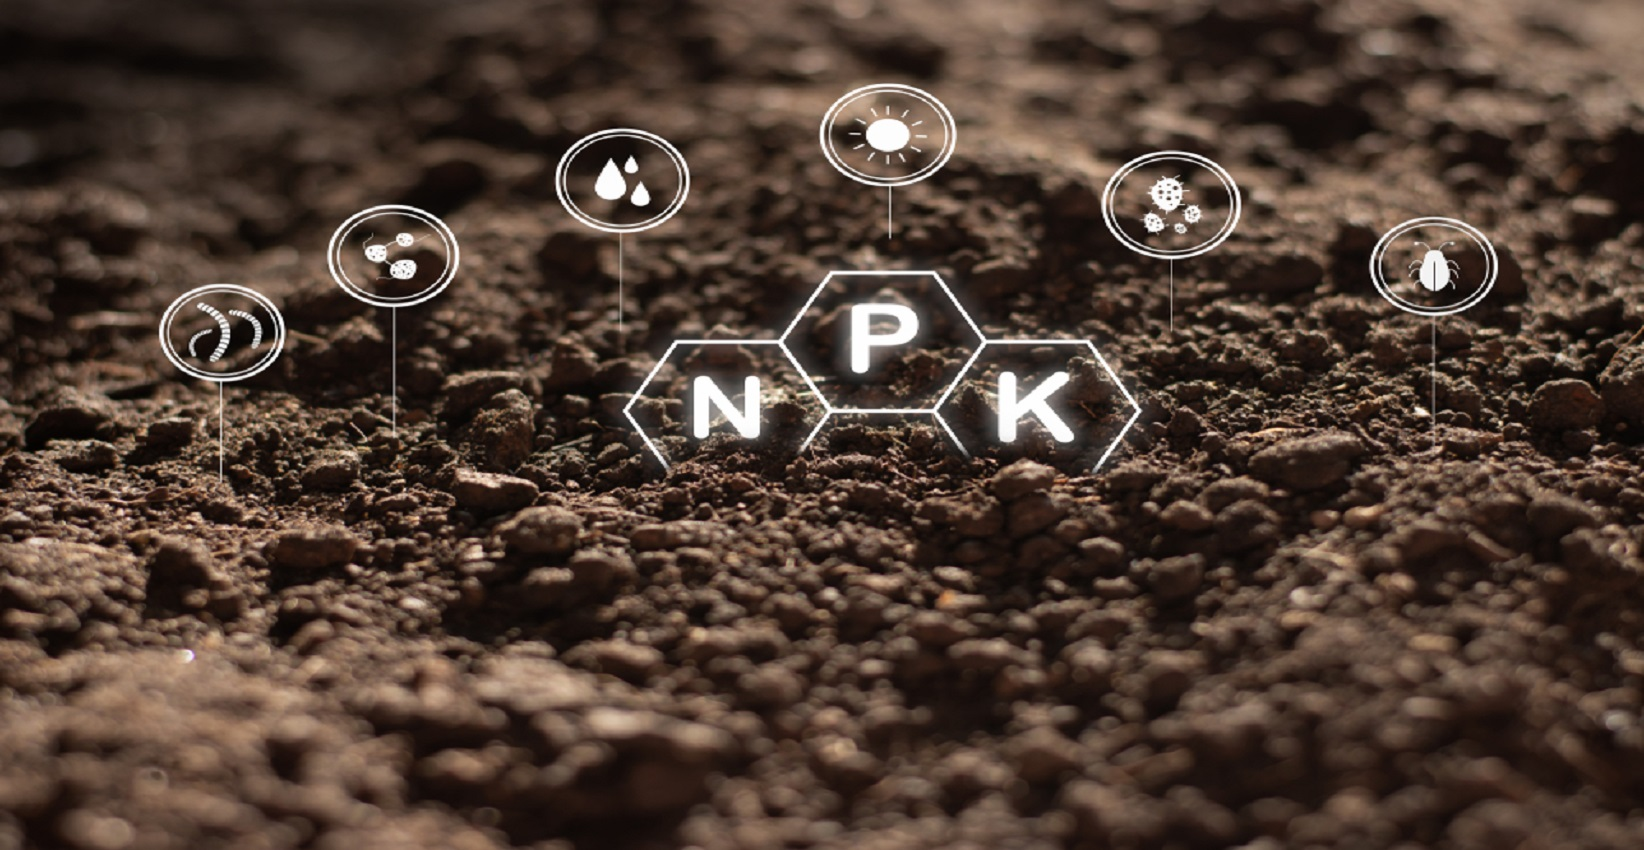 3.shutterstock_1531356470_ nutrient management